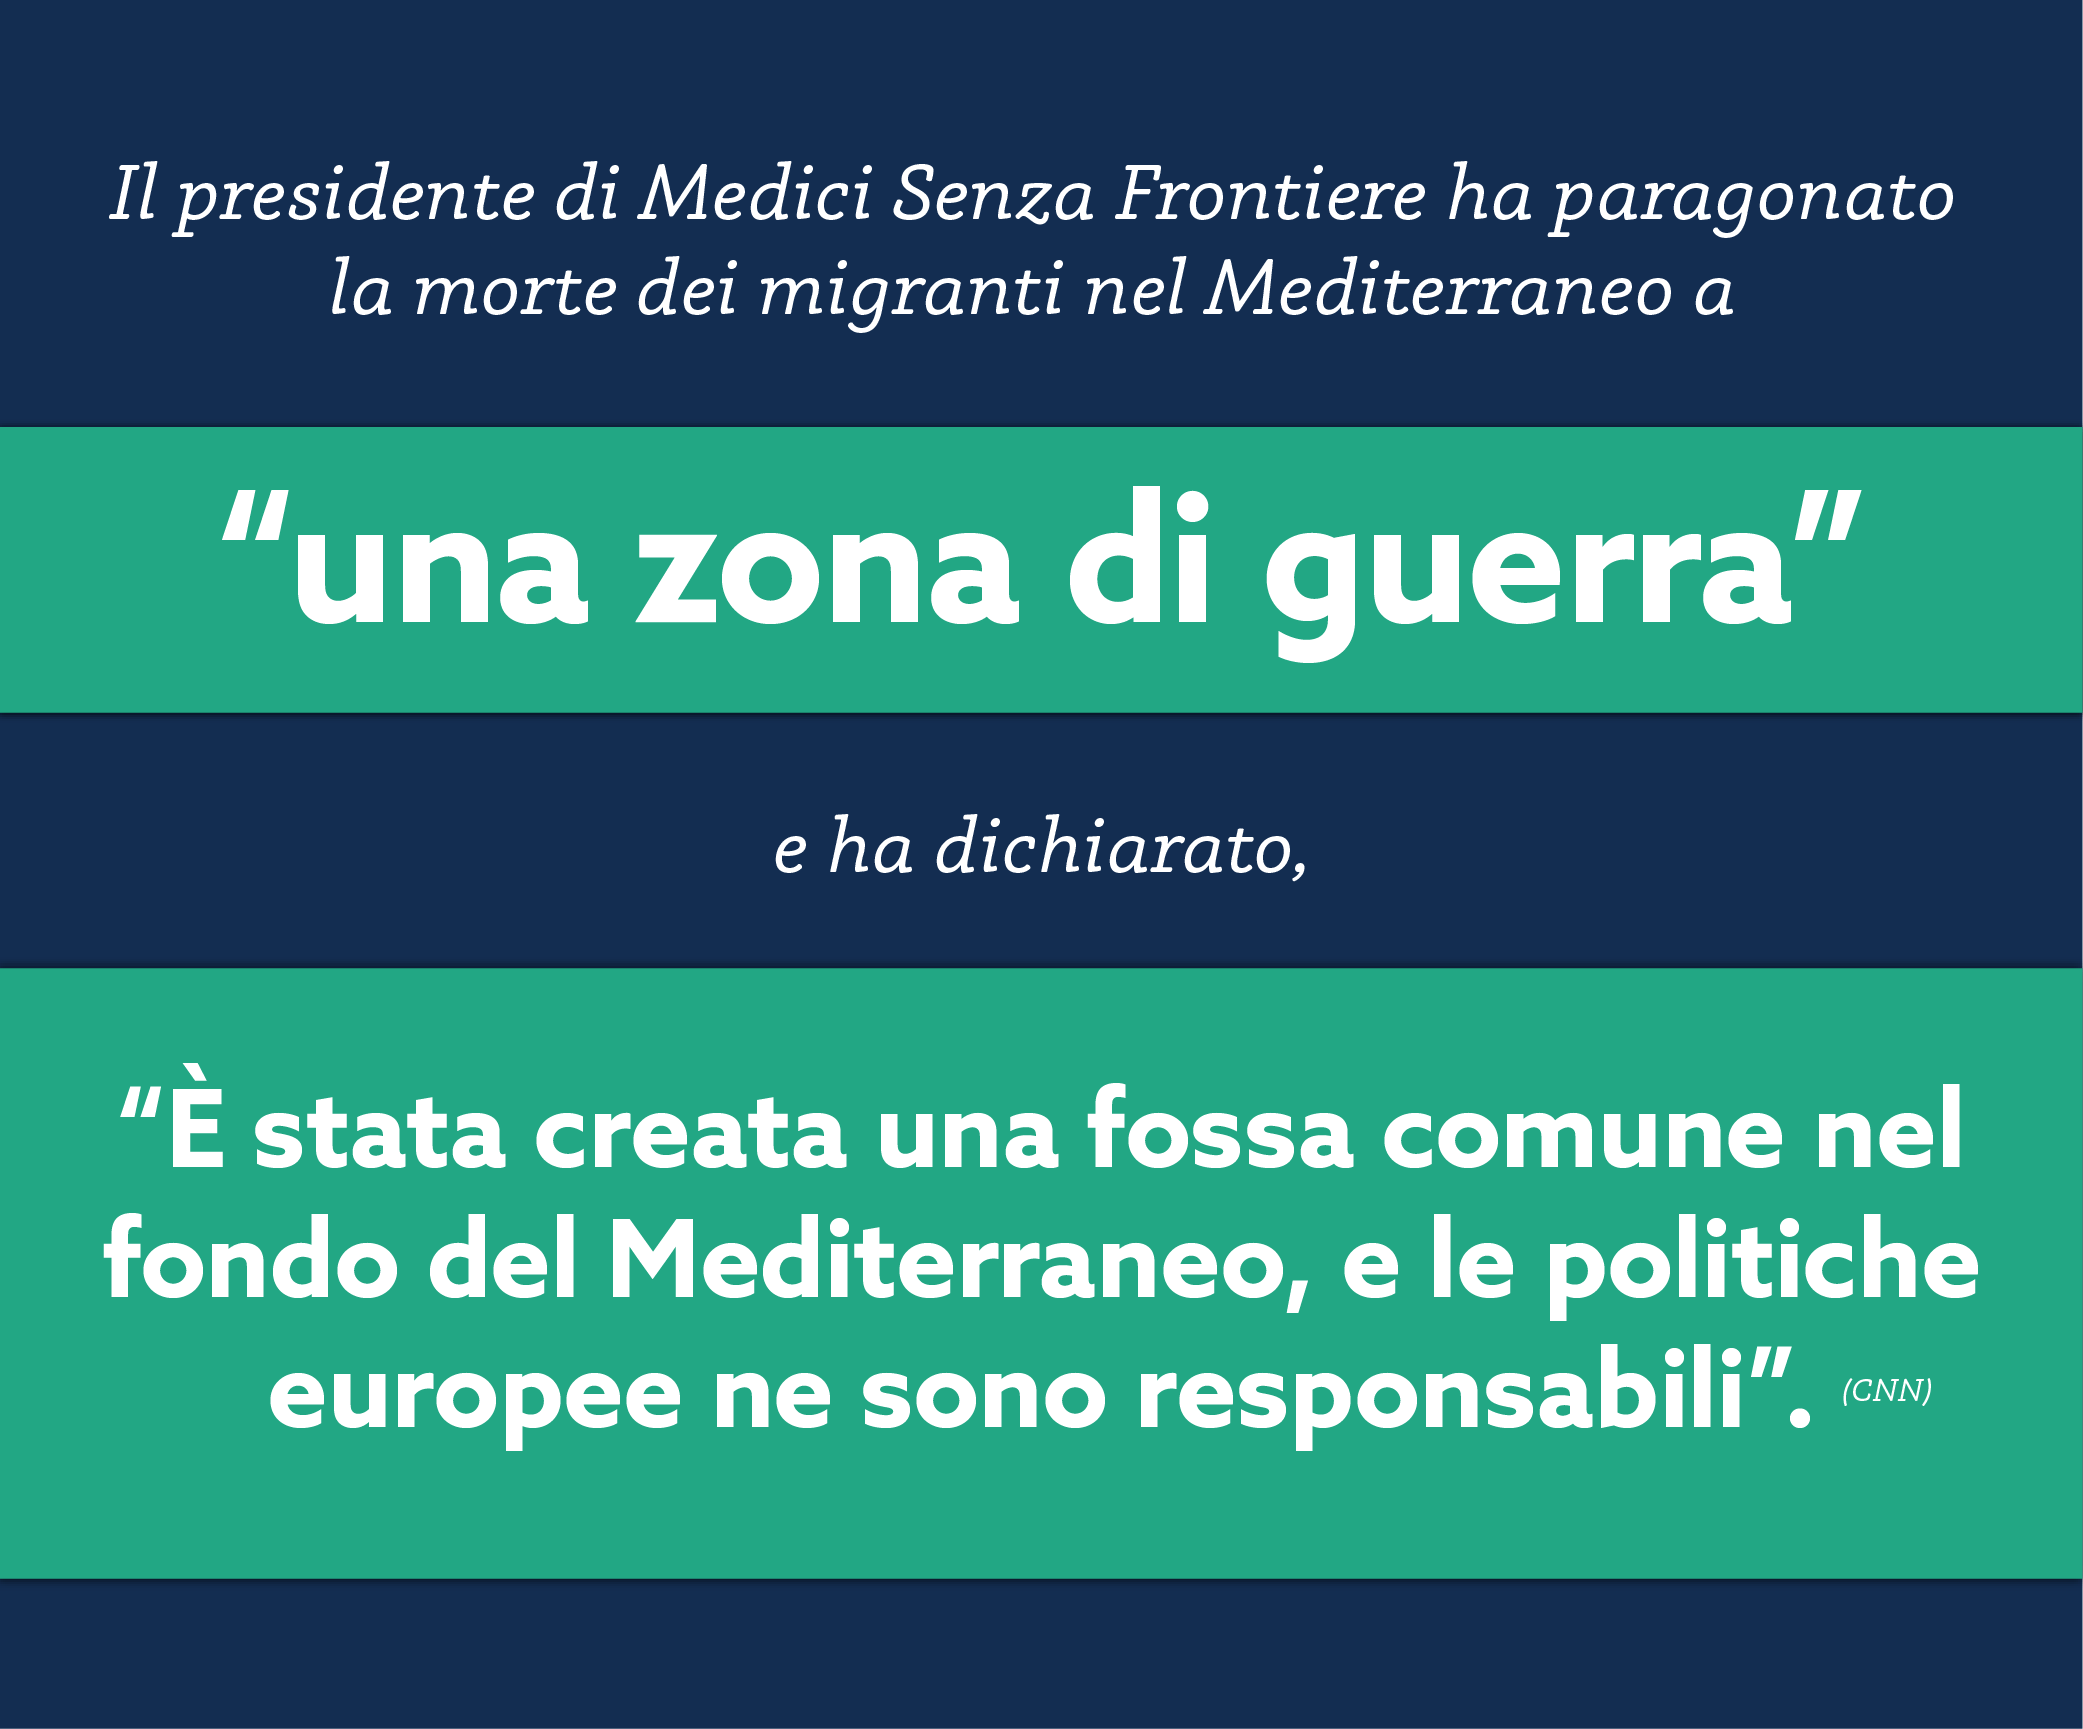 ITALIAN_Migrants_Organized_Part1-05.png